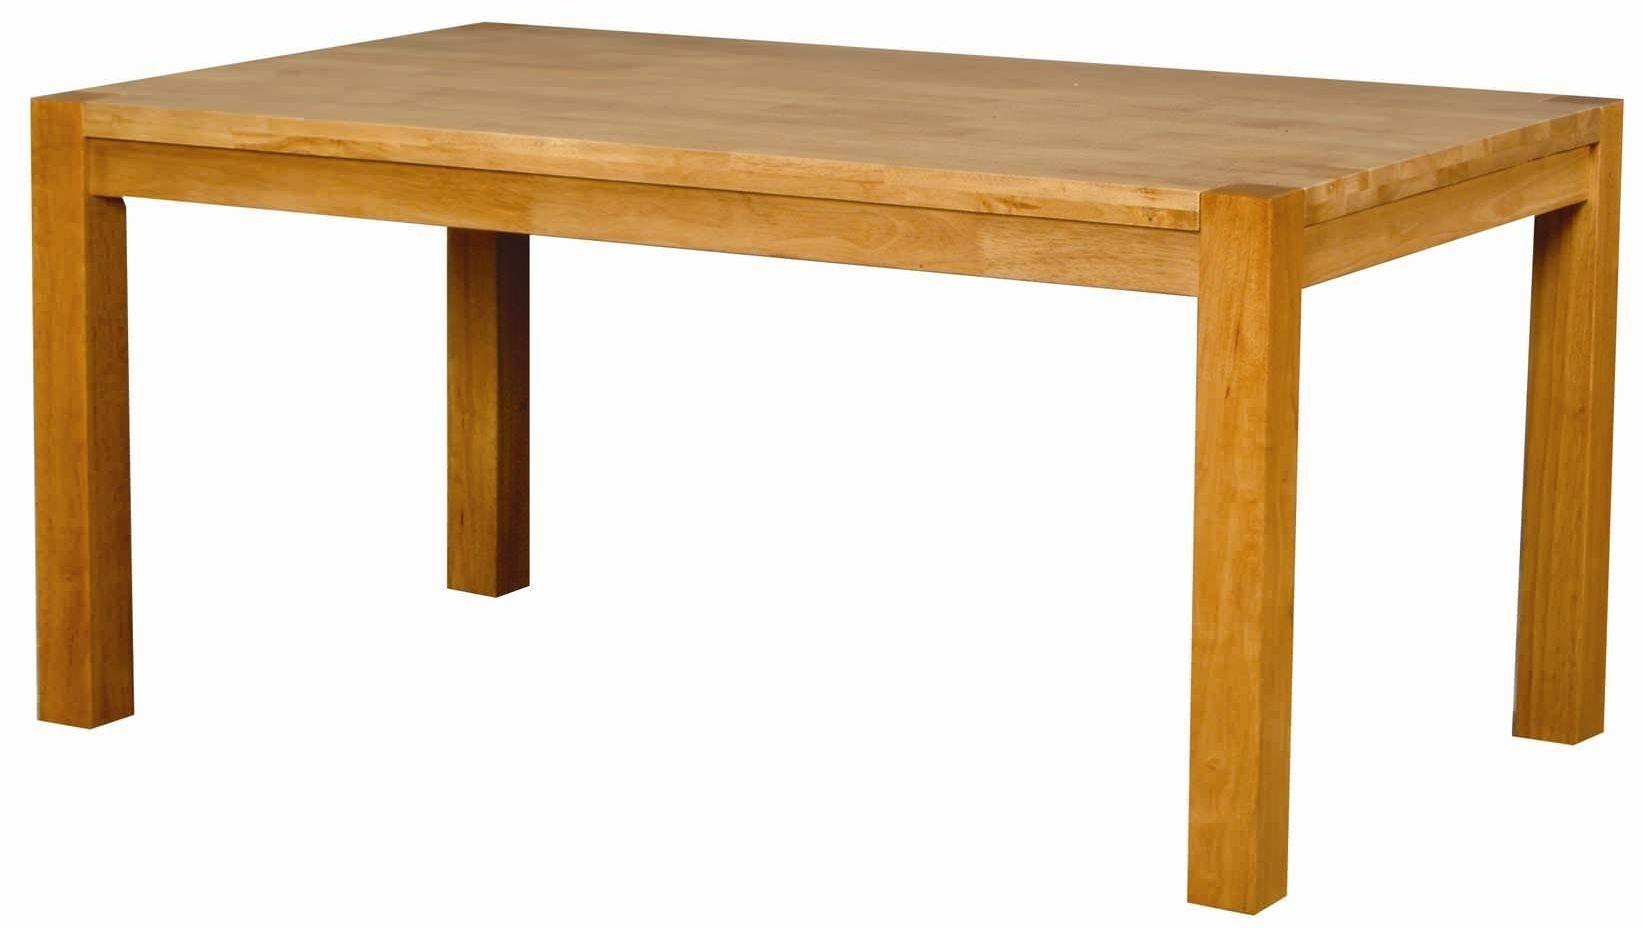 Eve Natural Oak Rectangular Dining Table - 120cm